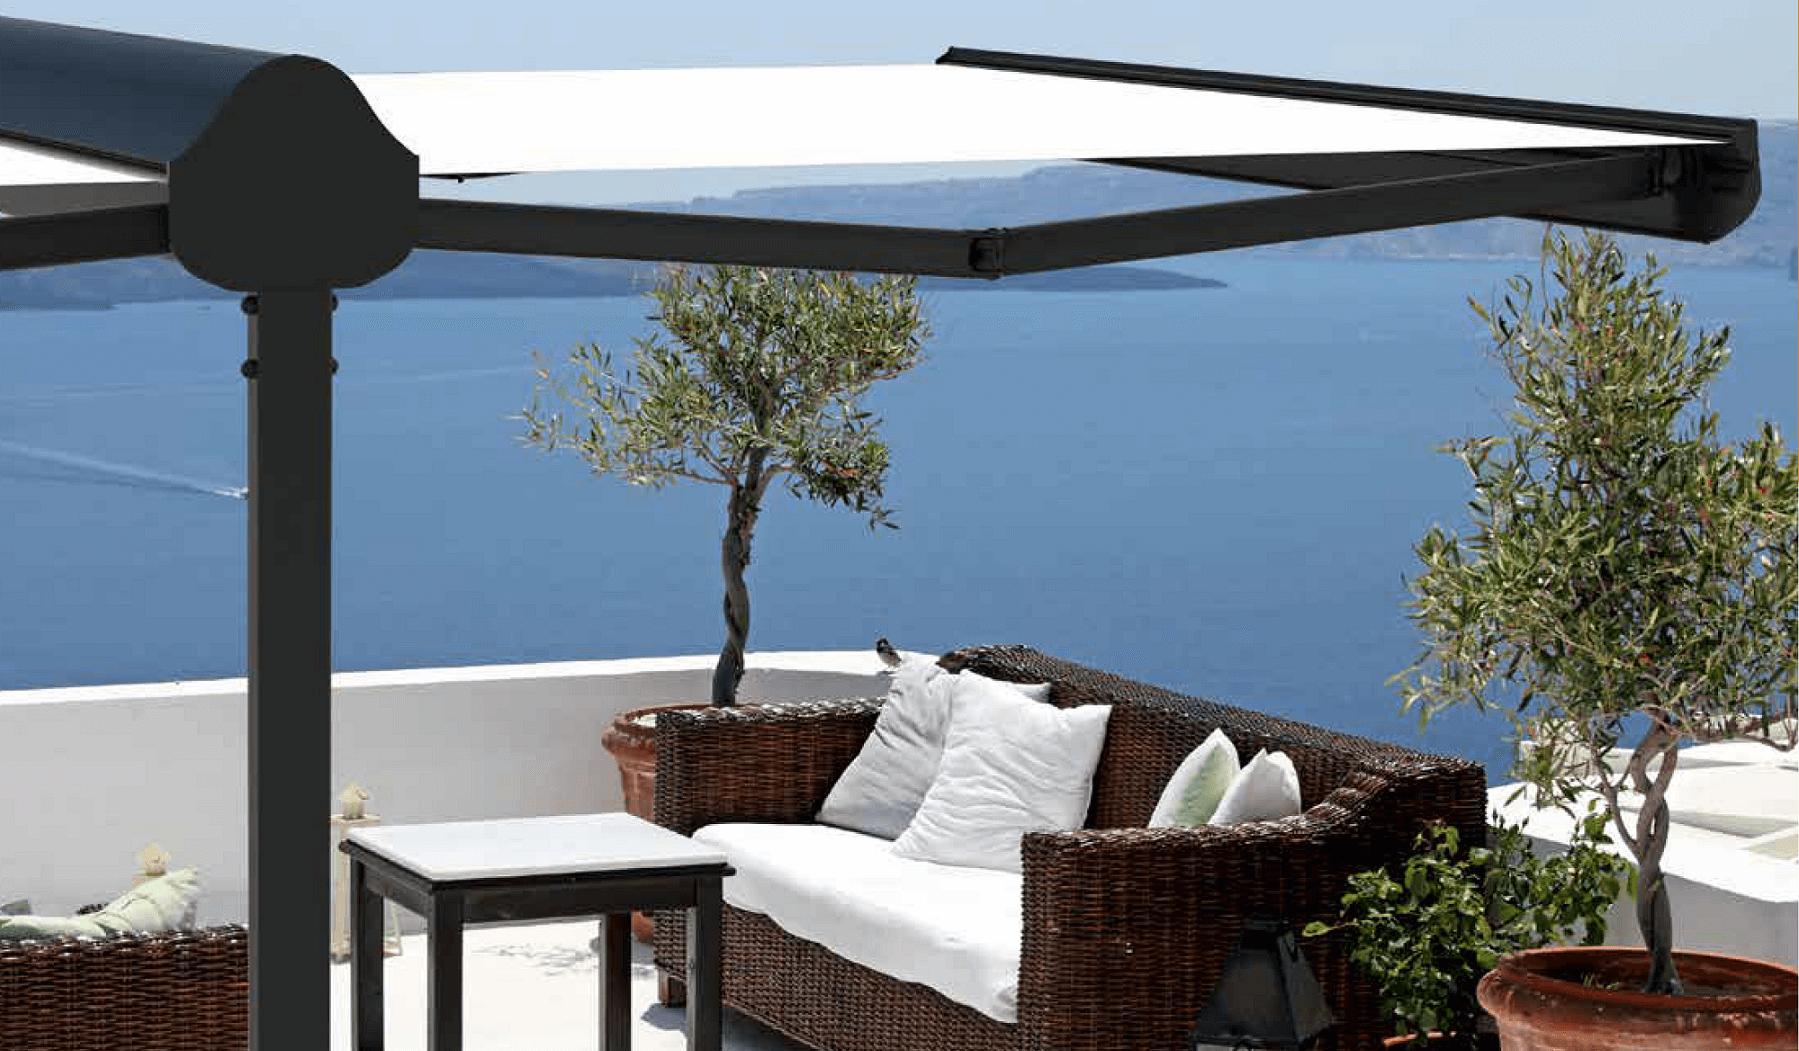 installateur stores bannes sur mesure solabaie. Black Bedroom Furniture Sets. Home Design Ideas